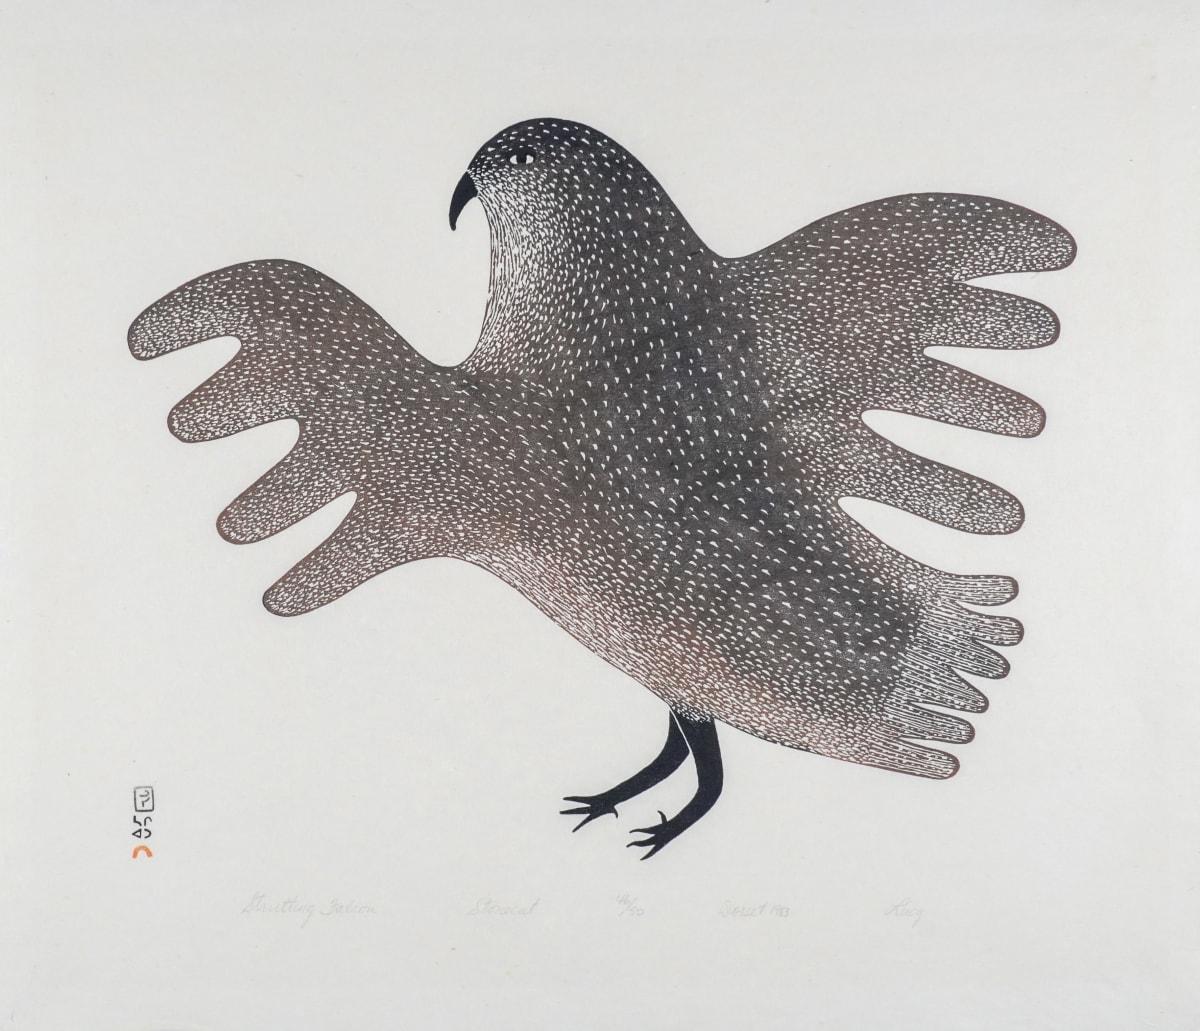 LOT 41 LUCY QINNUAYUAK (1915-1982) KINNGAIT (CAPE DORSET) Strutting Falcon, 1983 stonecut, 21 x 24 1/2 in (53.3 x 62.2 cm) ESTIMATE: $800 - $1,200